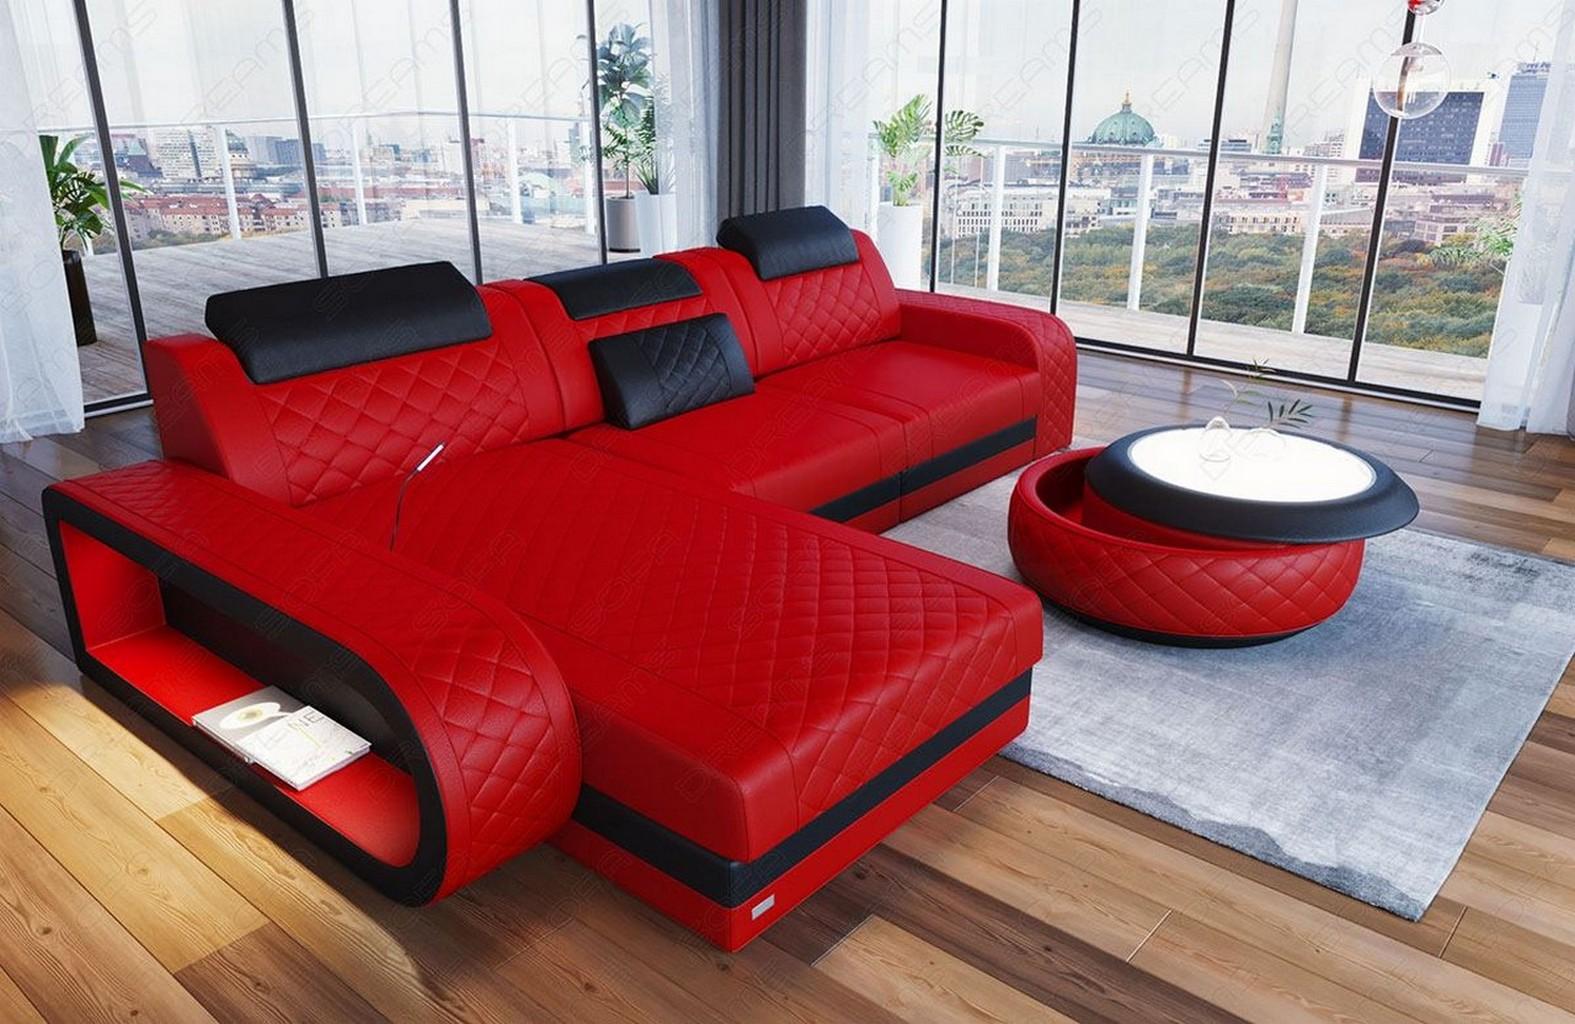 ledersofa eckcouch sofa design luxus couch berlin l form. Black Bedroom Furniture Sets. Home Design Ideas